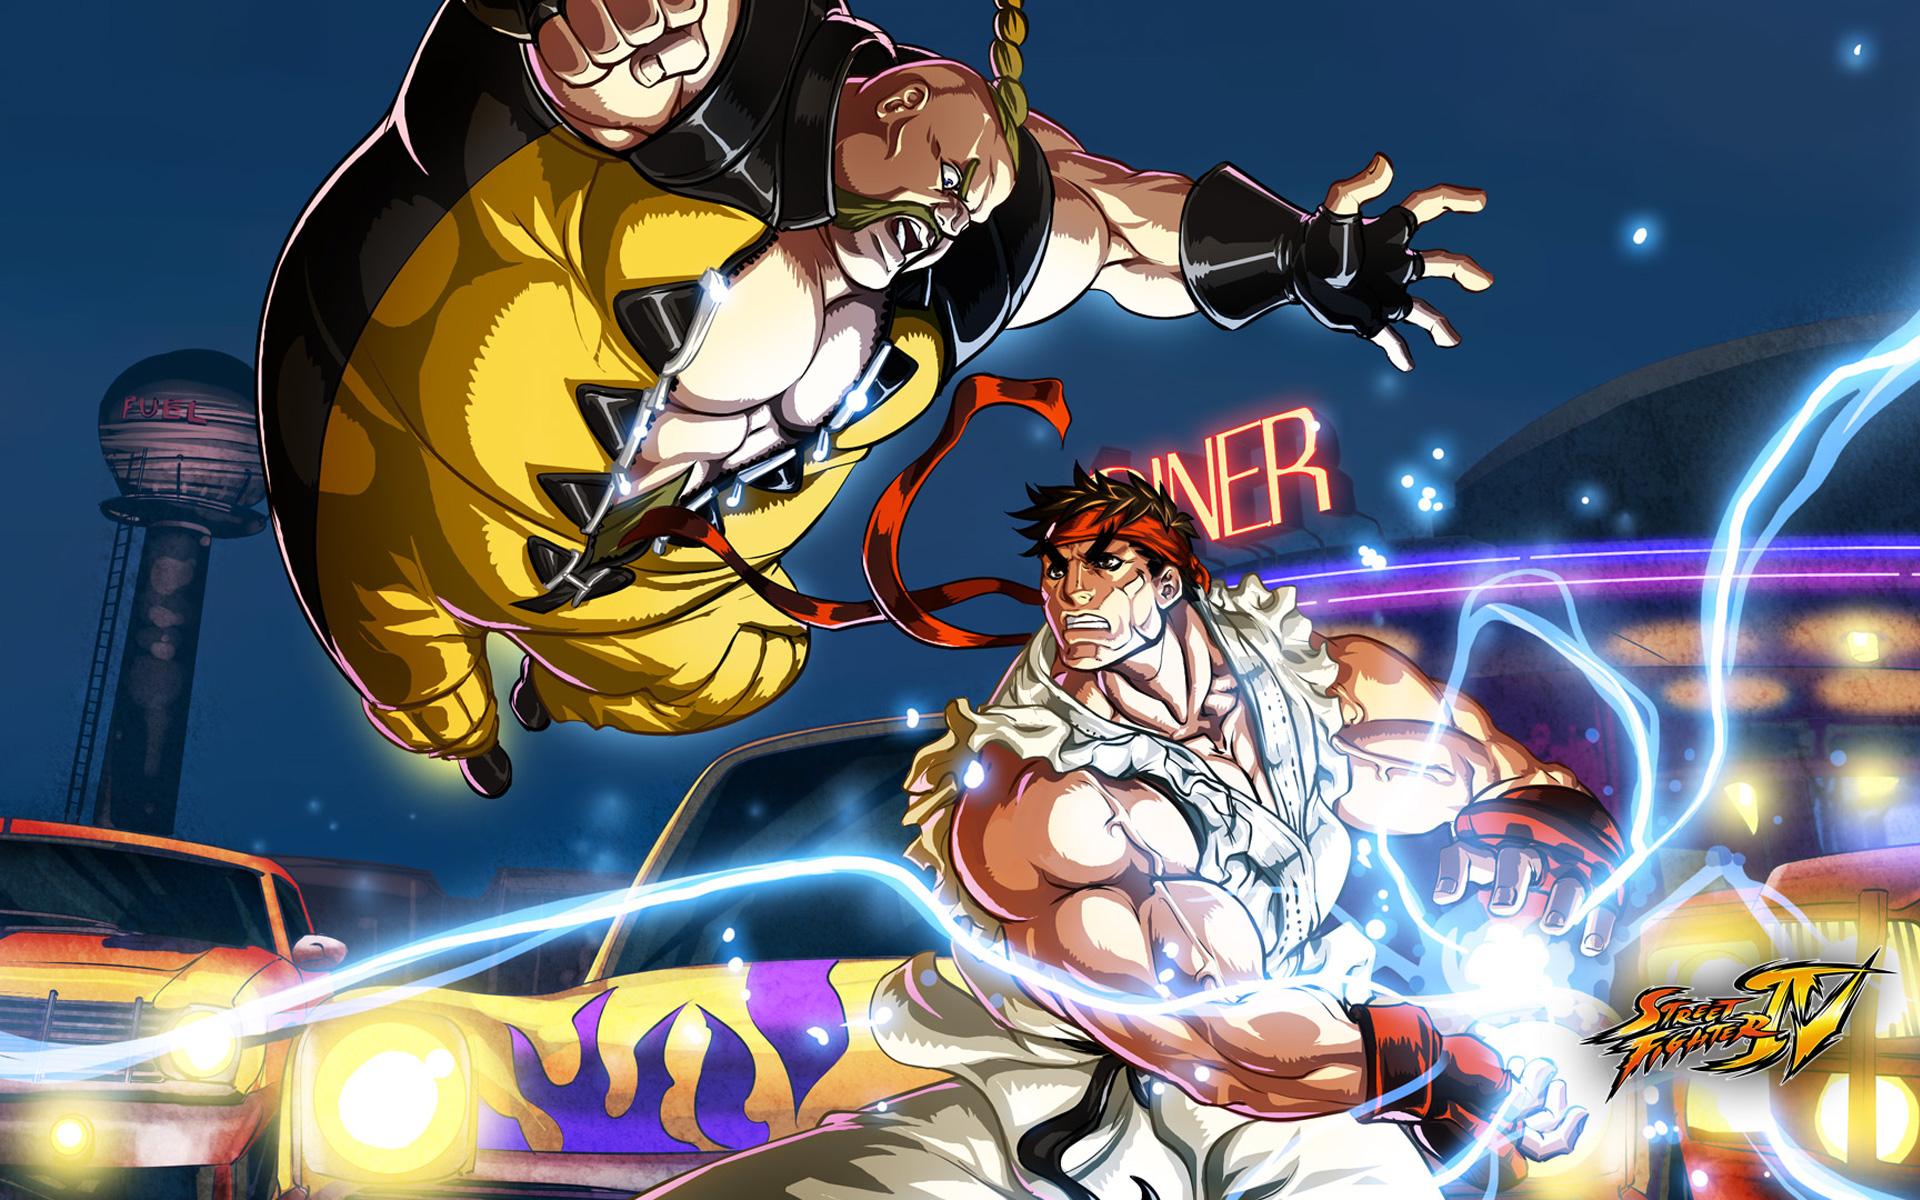 Street Fighter 4 Wallpapers: Street Fighter HD Wallpaper